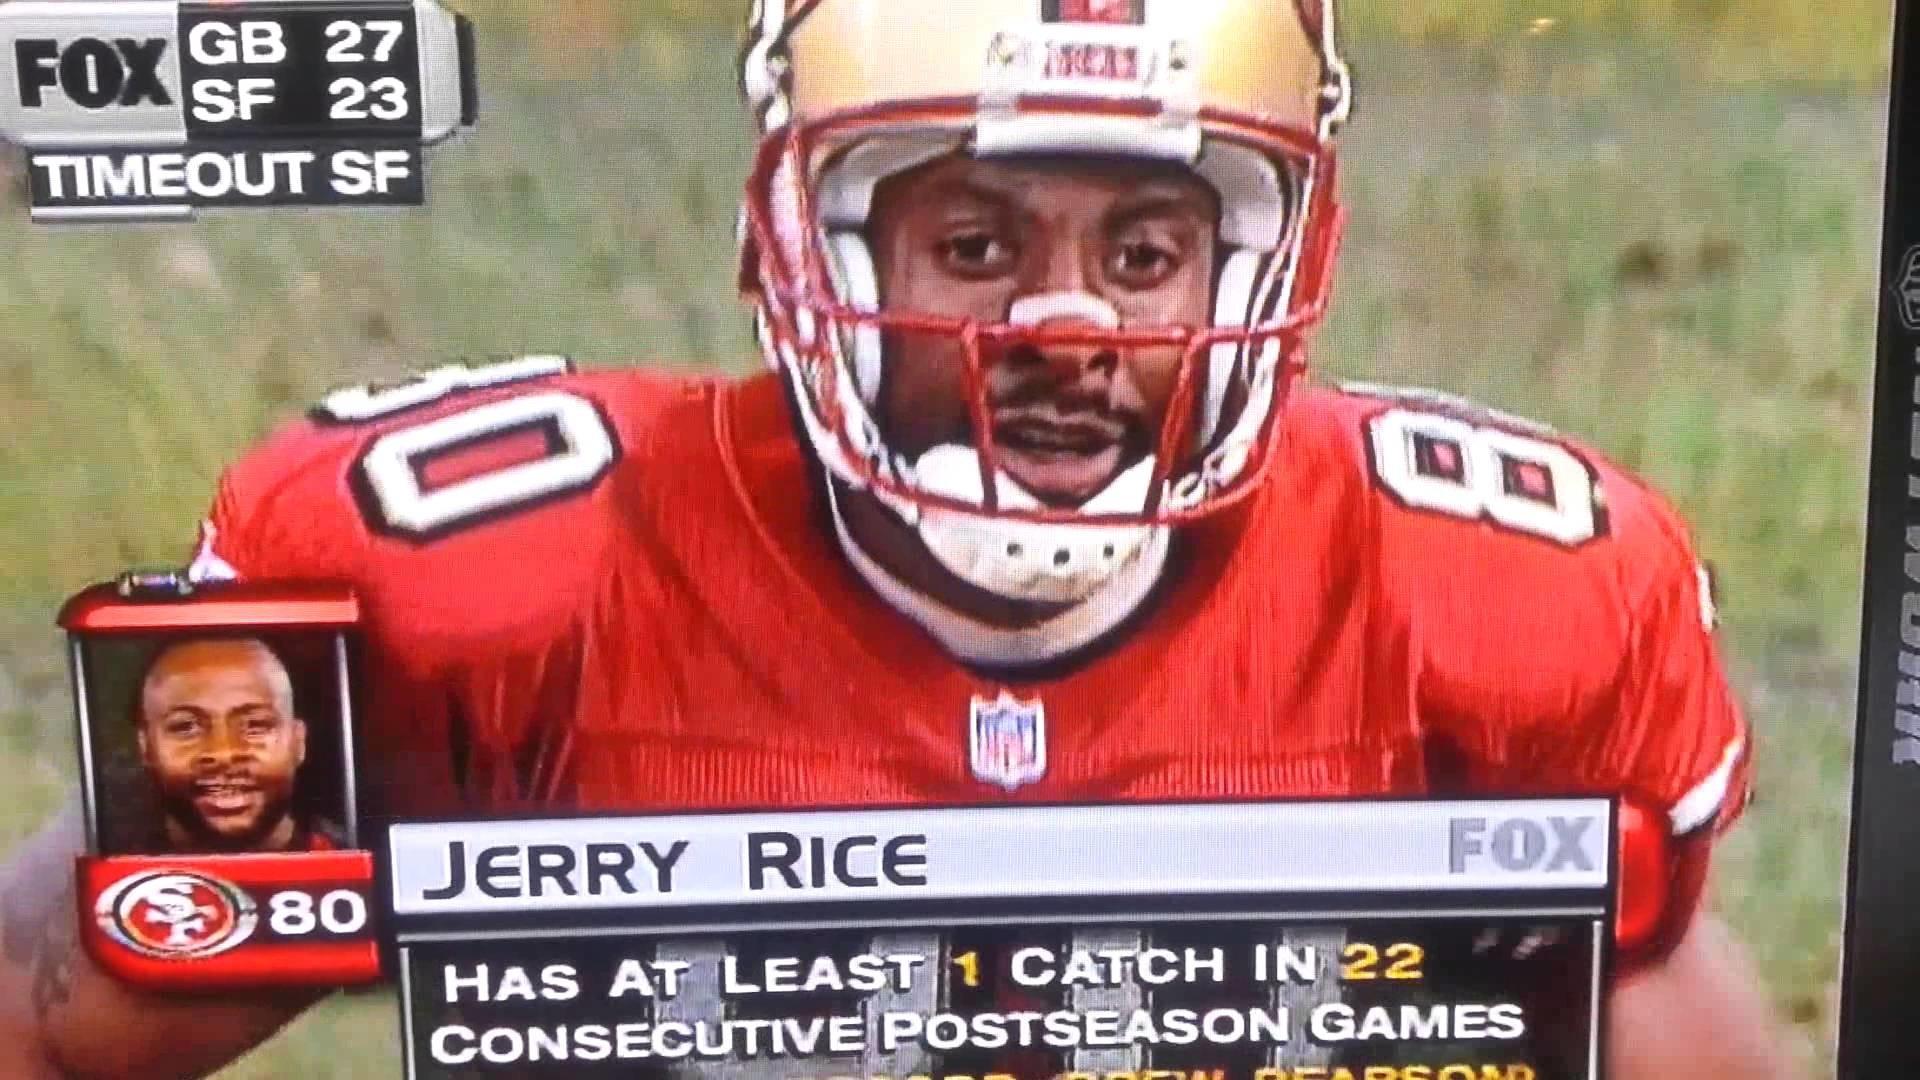 Jerry Rice still fumbled